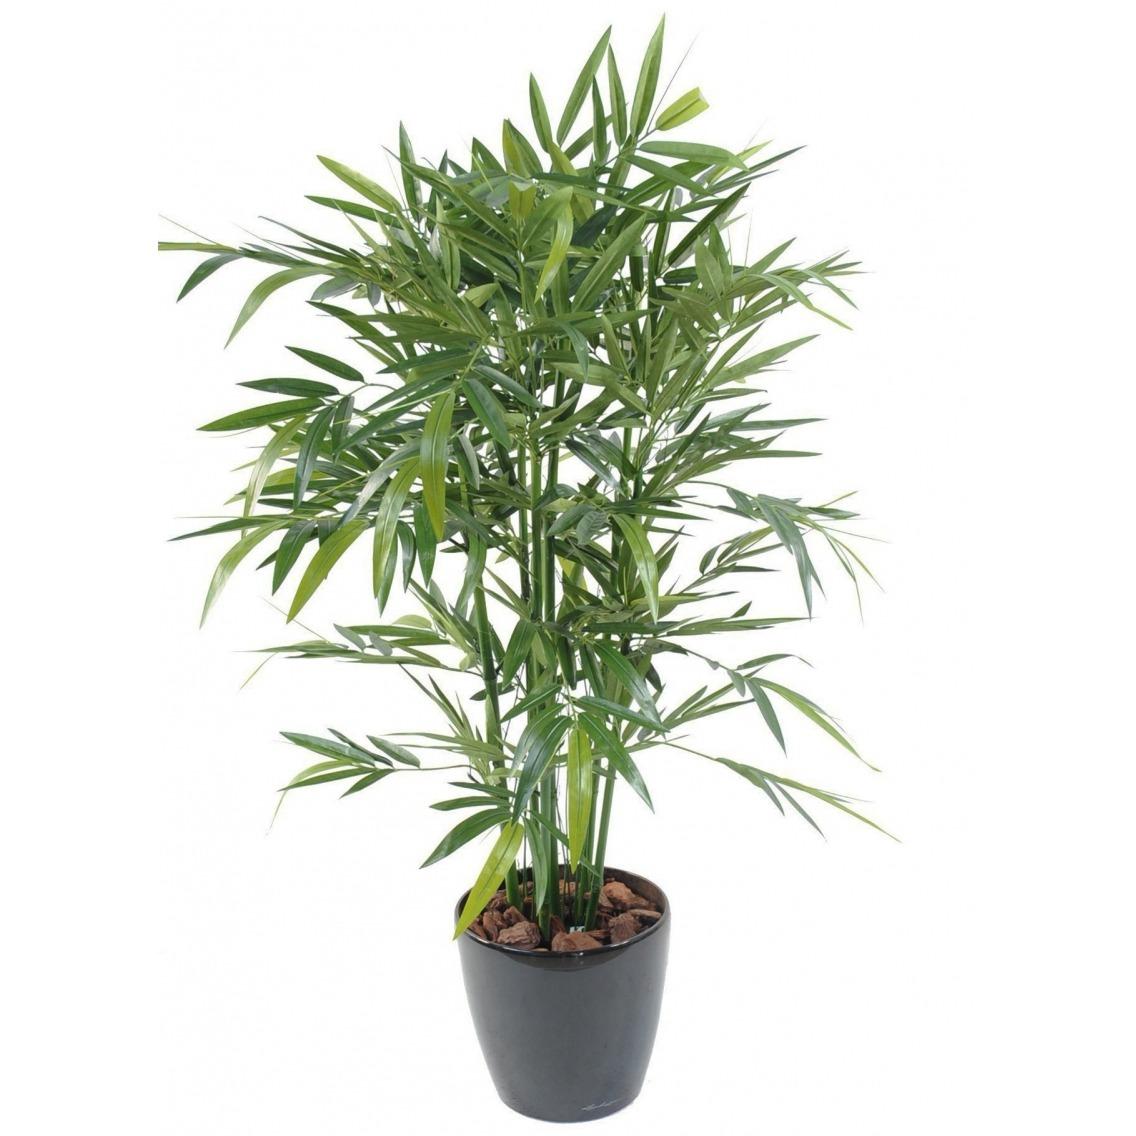 Bambou vert multi-cannes